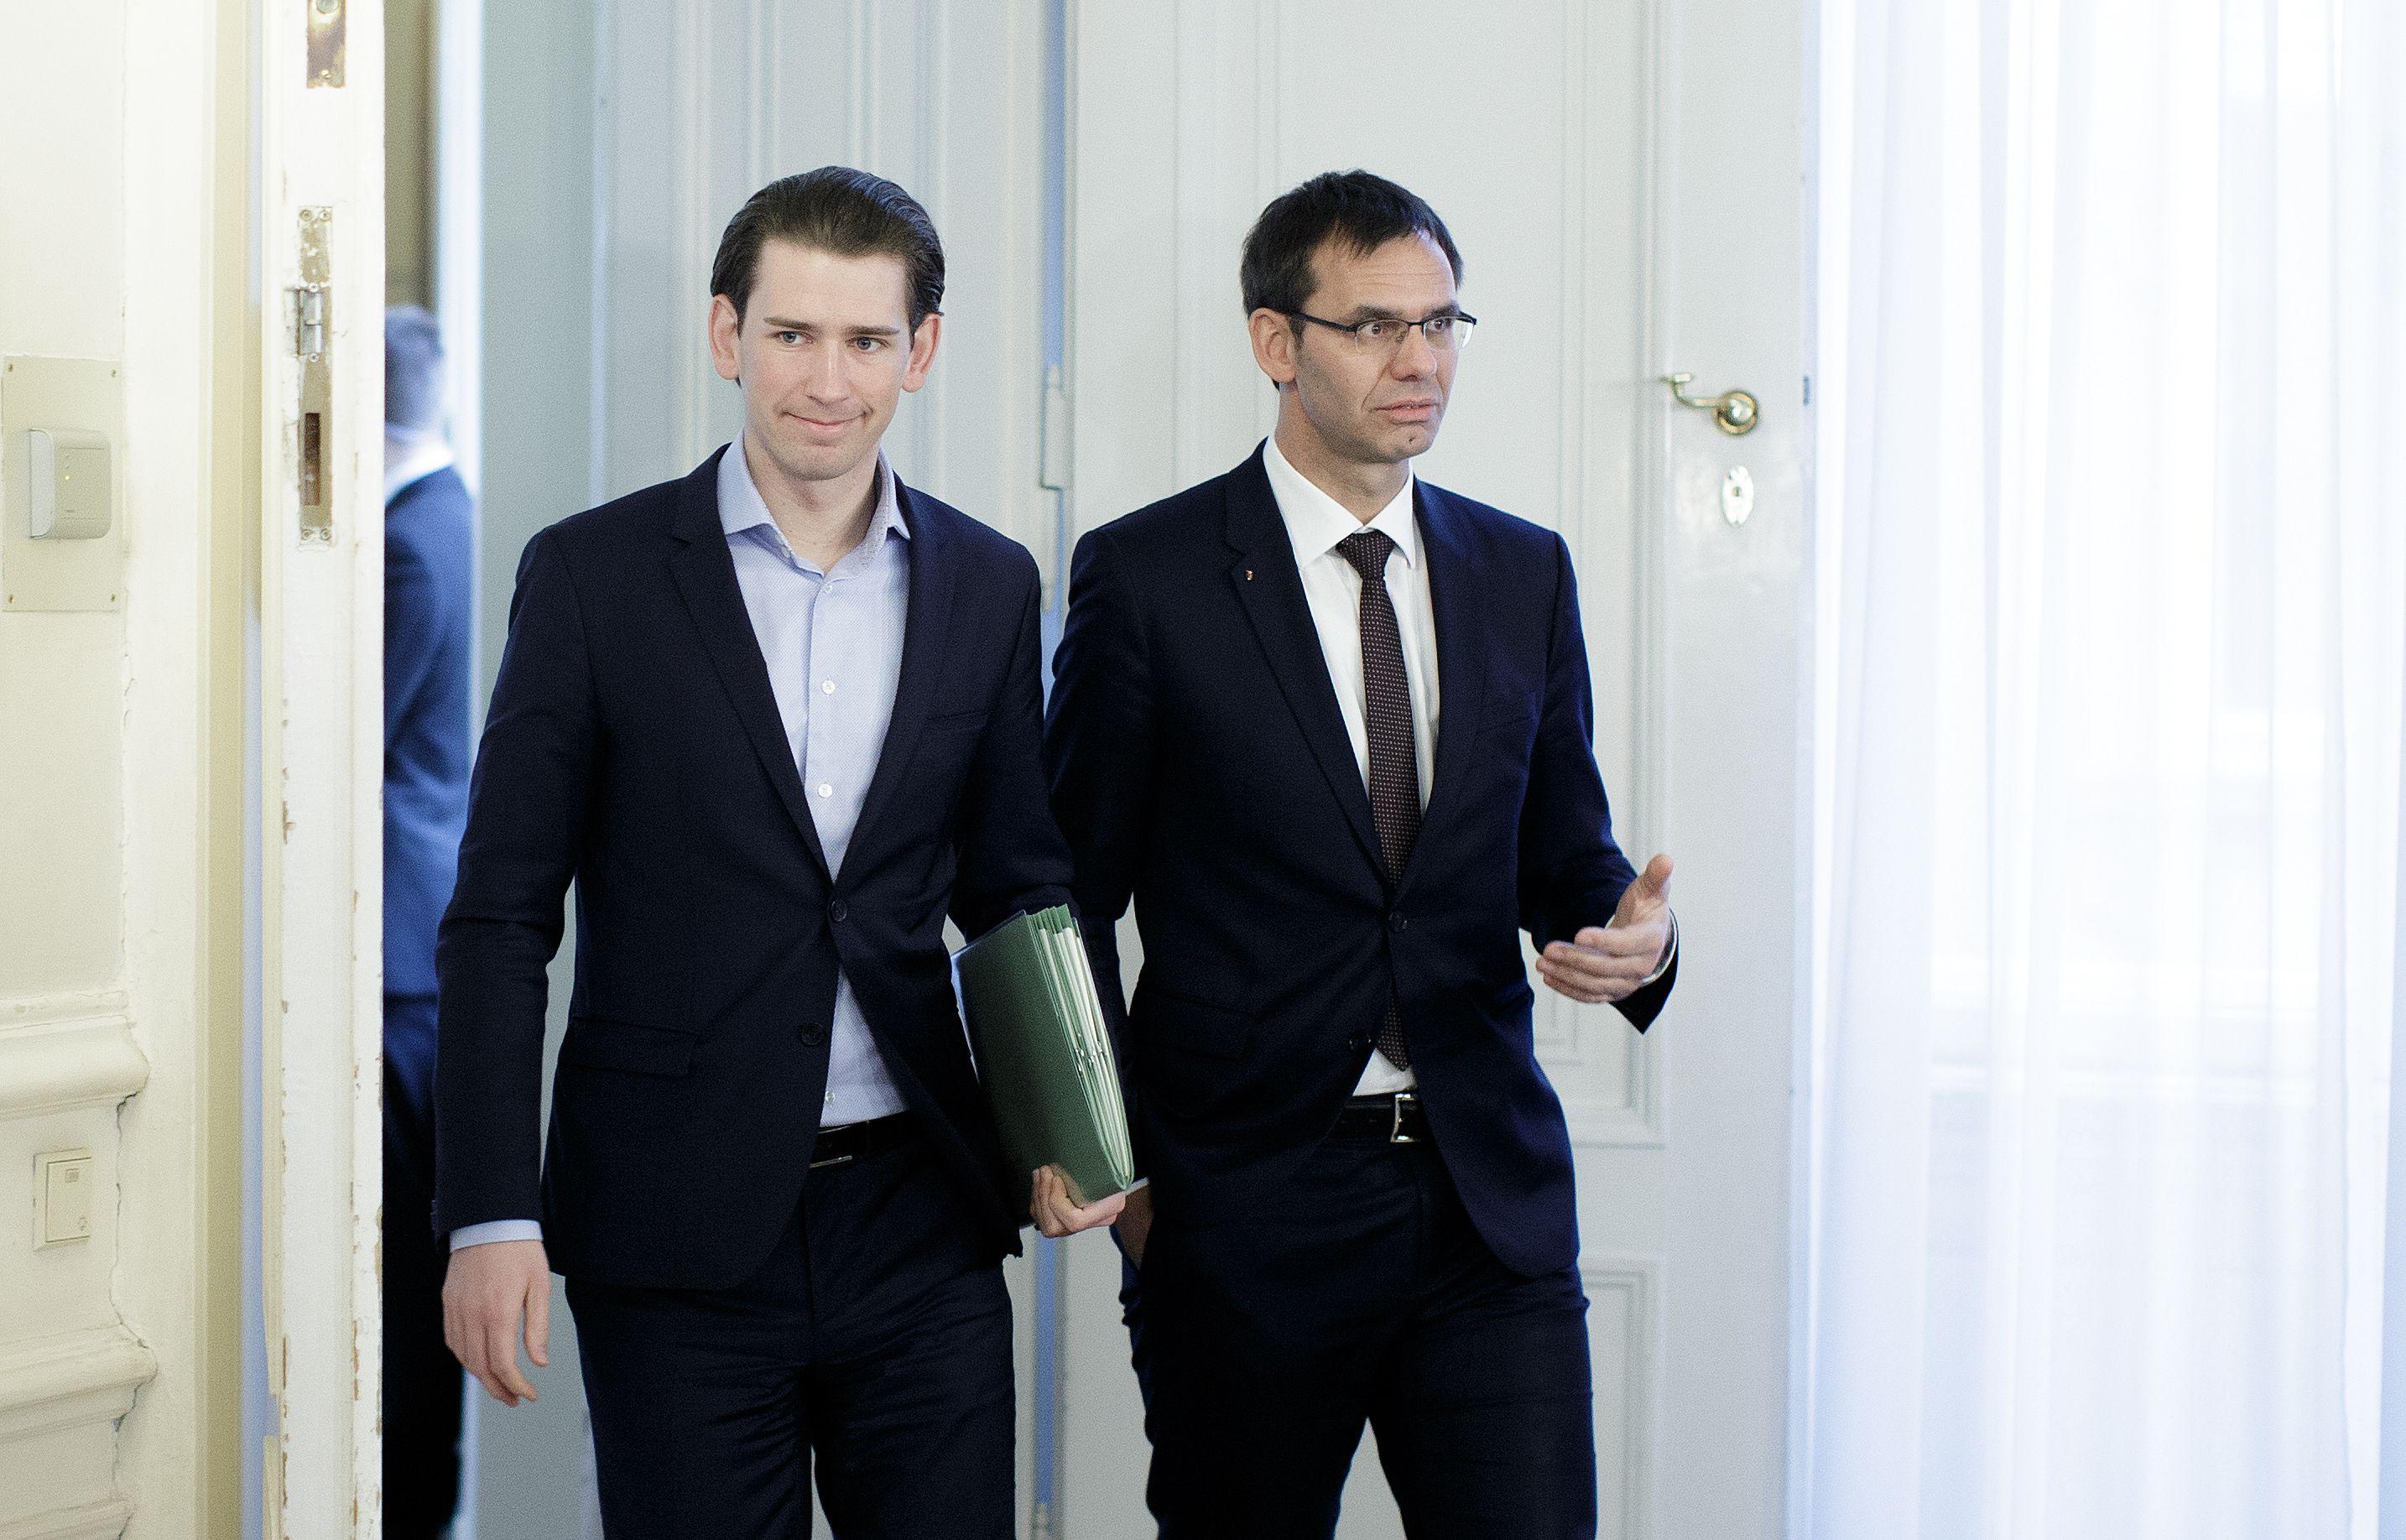 Regierungskrise: Wallner fordert Stabilität statt Chaos